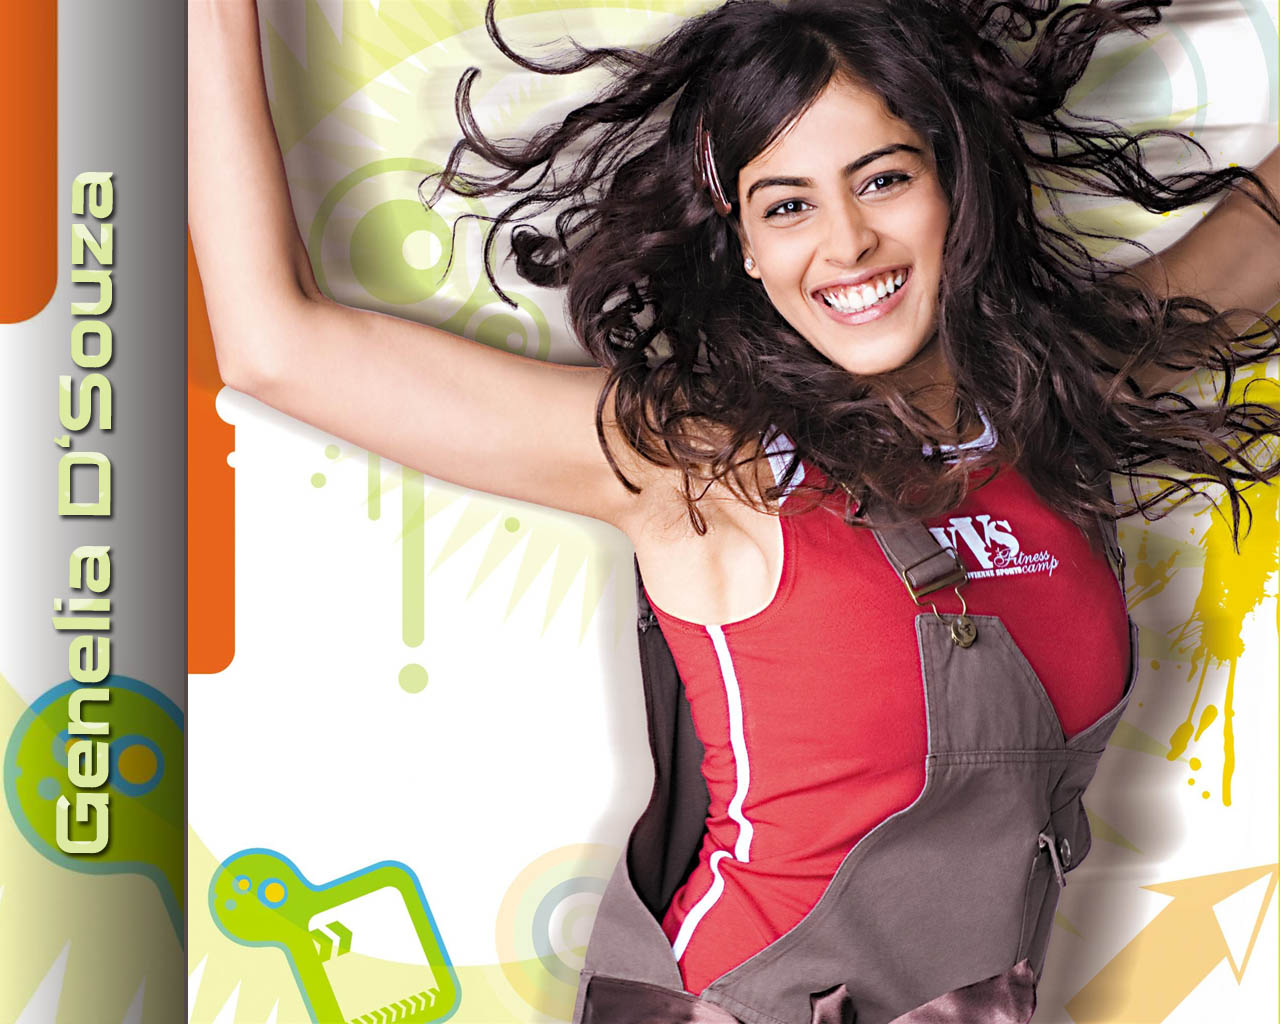 http://3.bp.blogspot.com/_P1DjZLm5WXk/TA3ghcTmPyI/AAAAAAAAEzk/Nd_sf9kwTTg/s1600/genelia+Wallpapers33.jpg